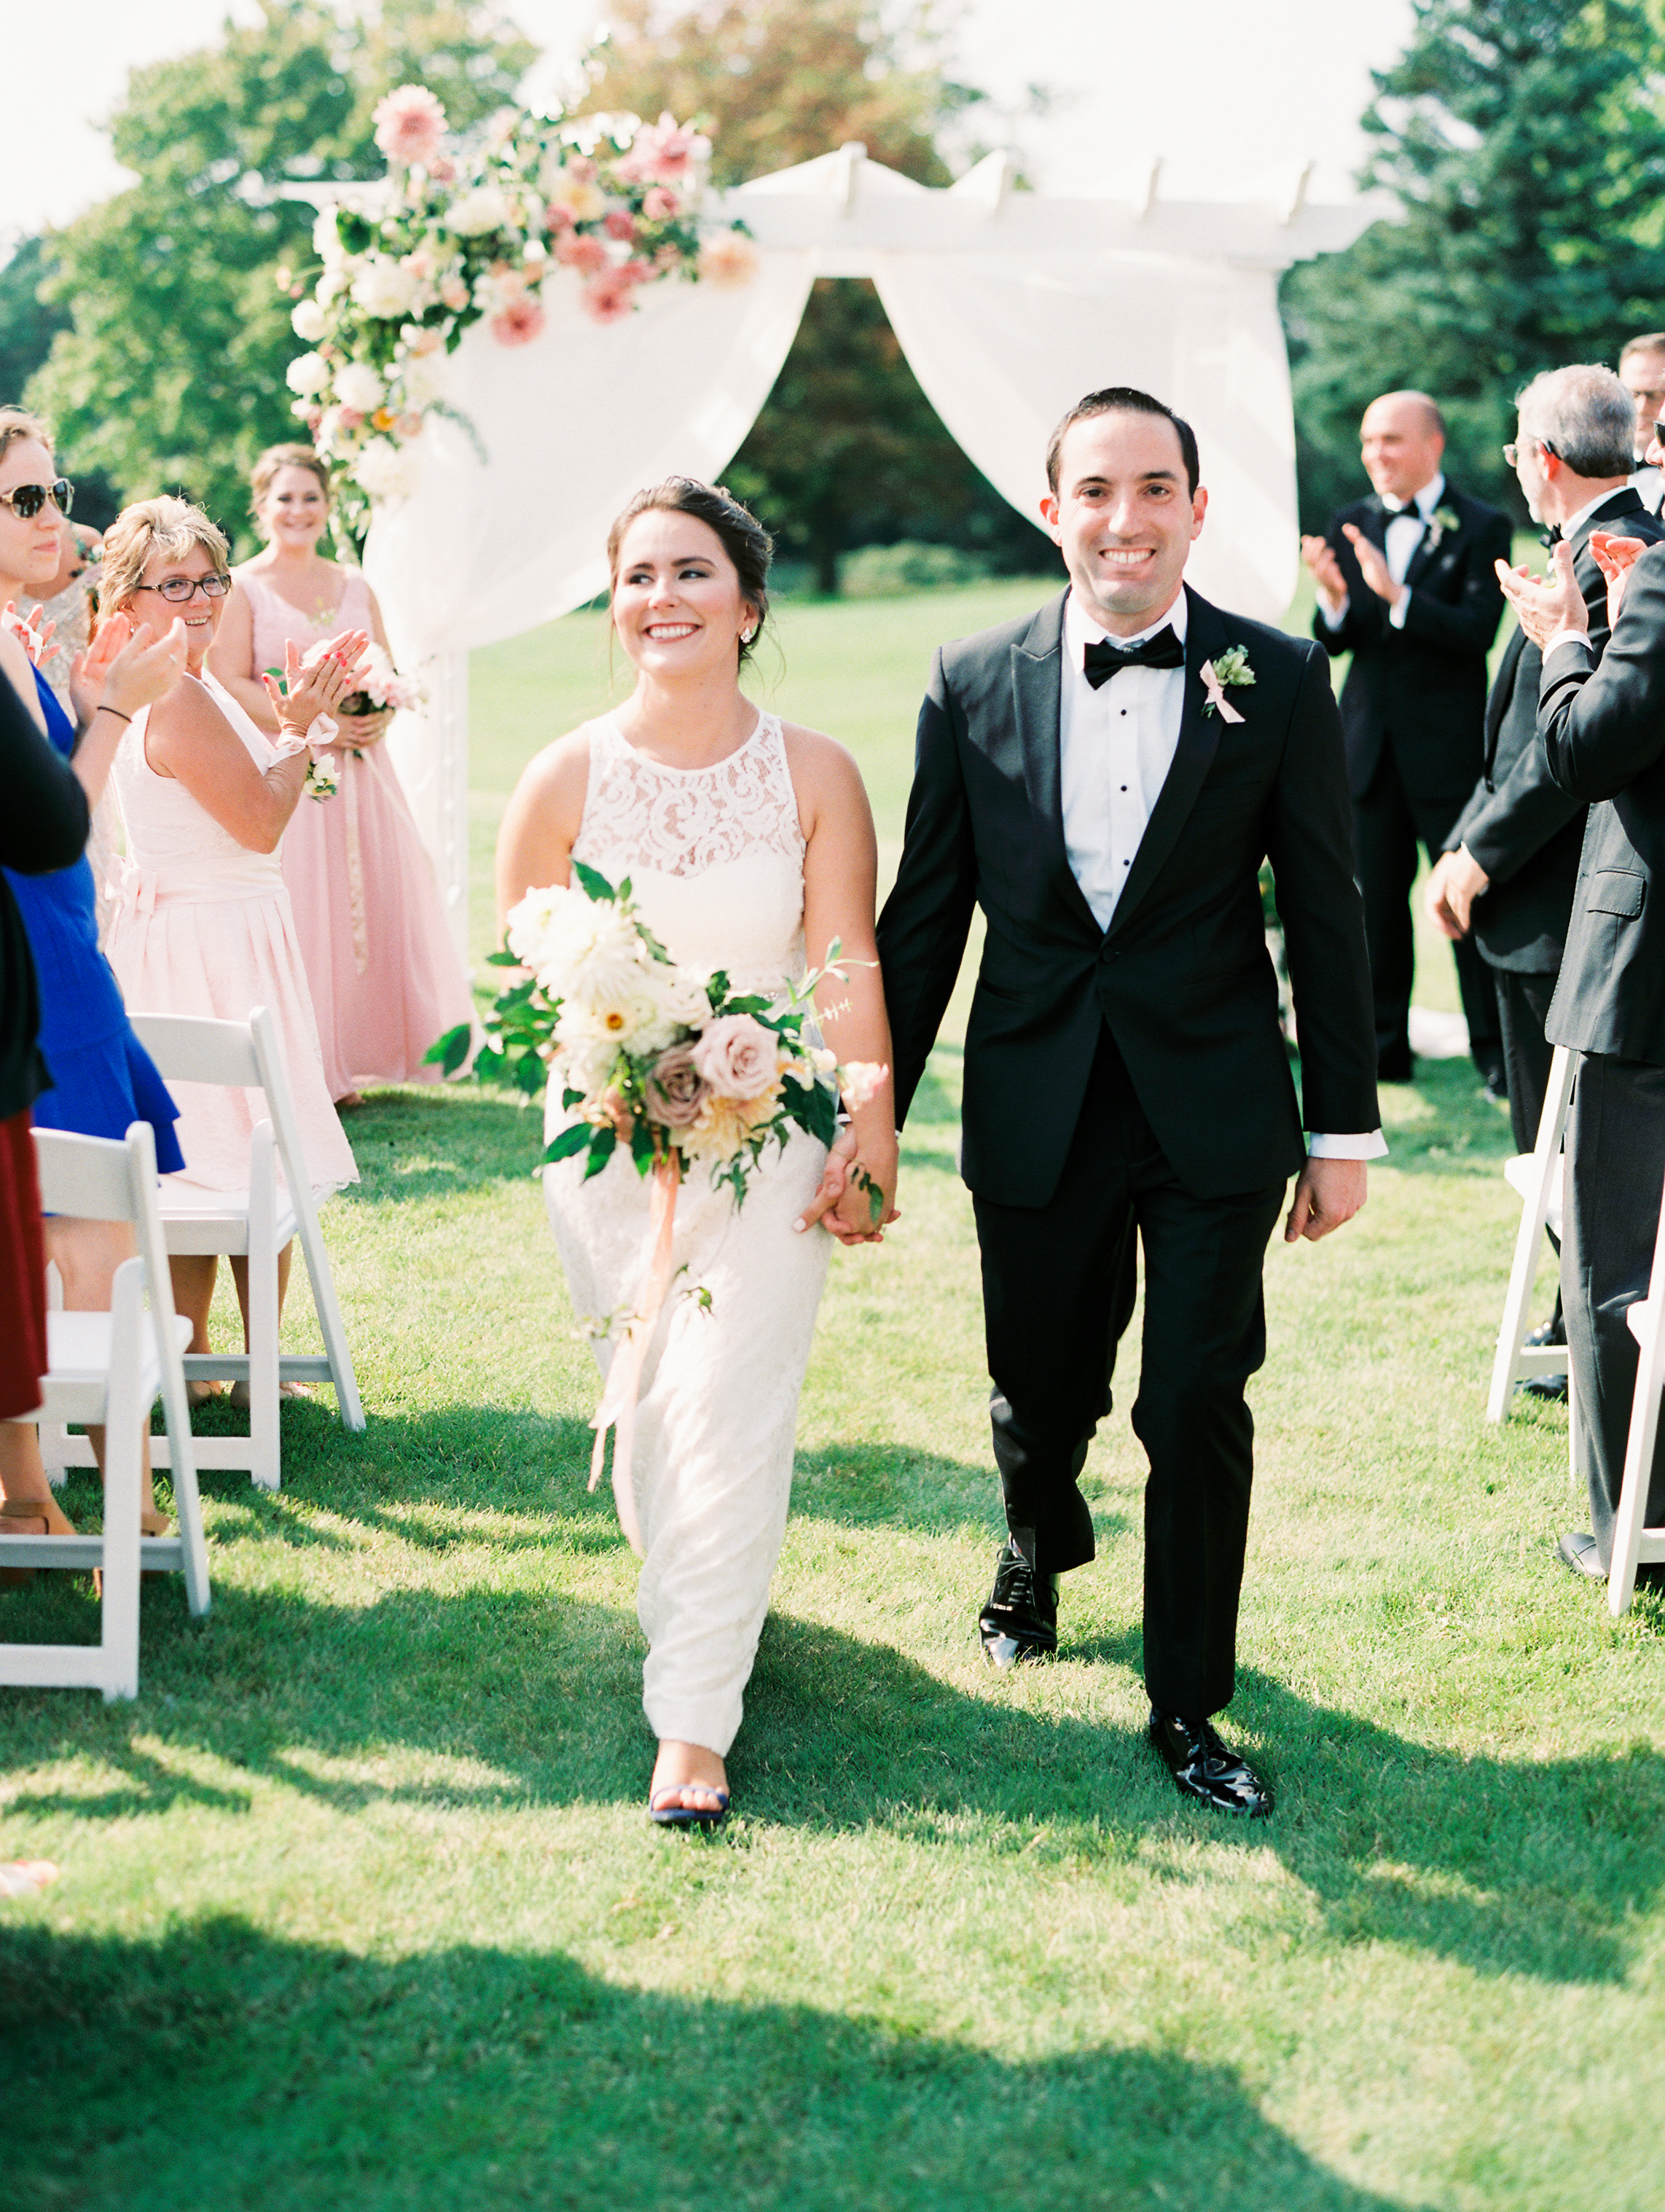 Zoller+Wedding+Ceremonyf-7.jpg